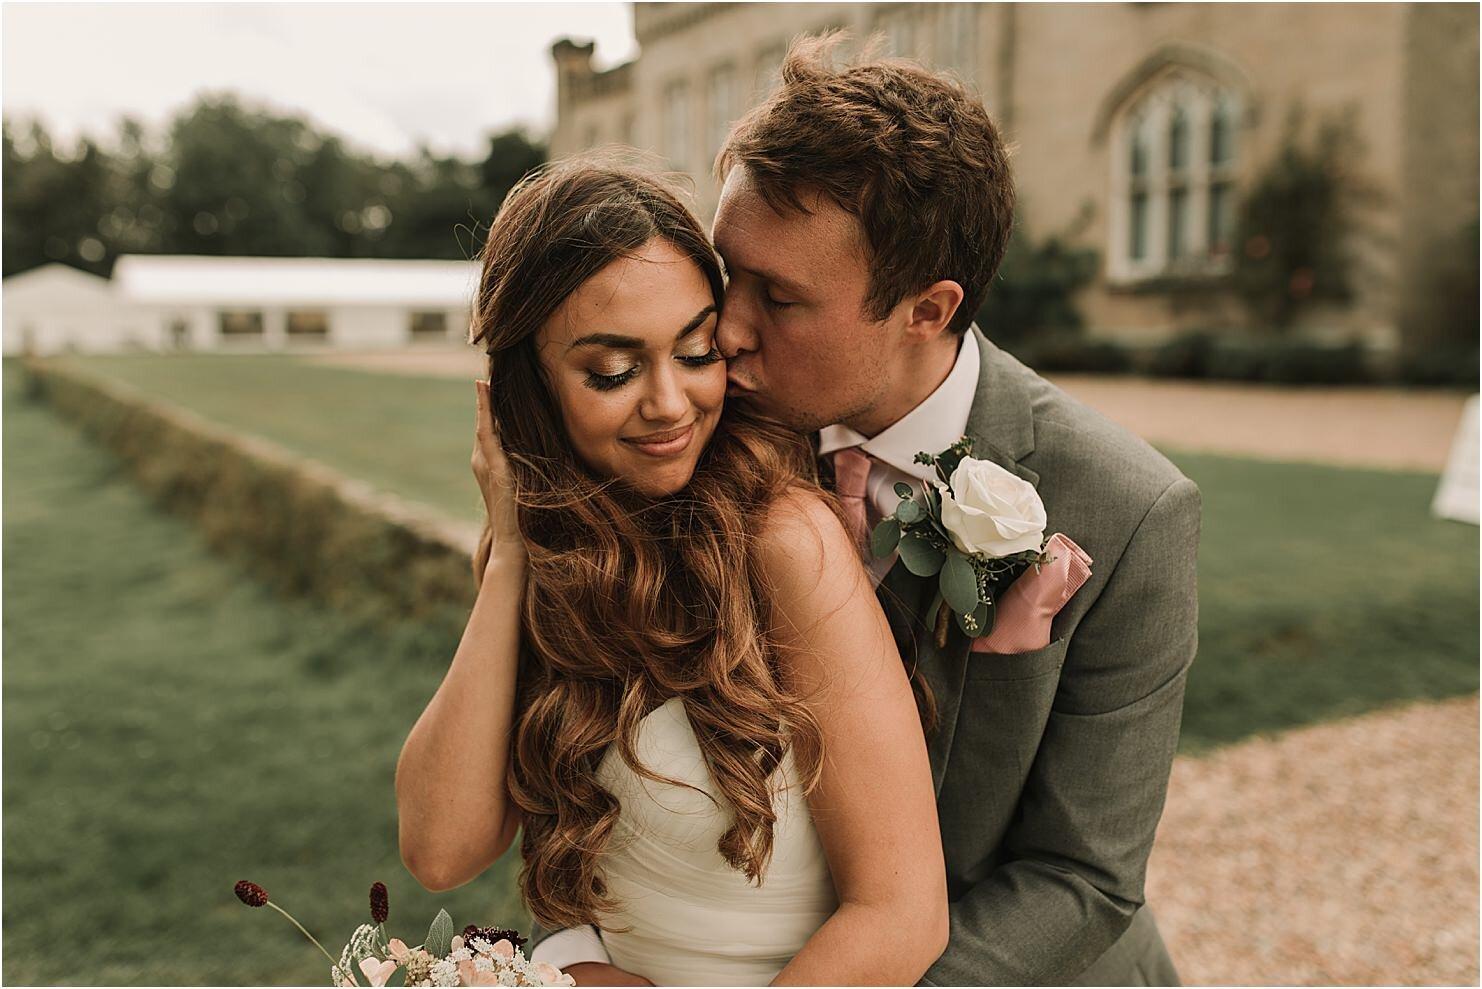 boda-de-cuento-en-castillo-boda-en-londres-67.jpg